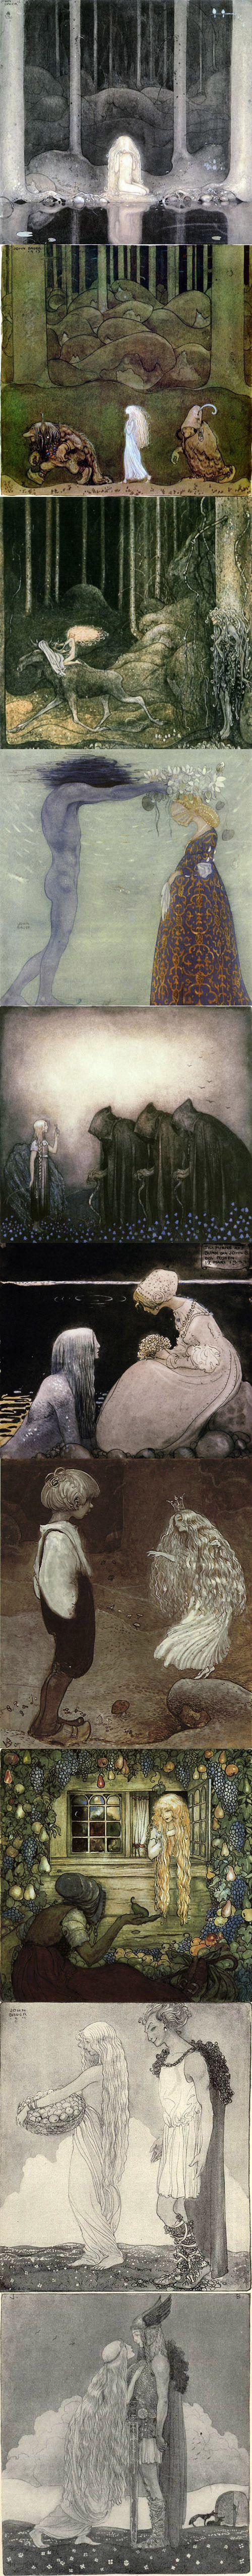 John Bauer(1882 - 1918)生于瑞典的火柴之都延雪平(Jönköping),自幼就显示出极高的艺术天赋,十六岁时来到斯德哥尔摩学习绘画,两年后进入瑞典皇家艺术学院。他的插画广受欢迎,与那些美丽的民间故事一起陪伴无数孩子度过了他们童年的美好时光。